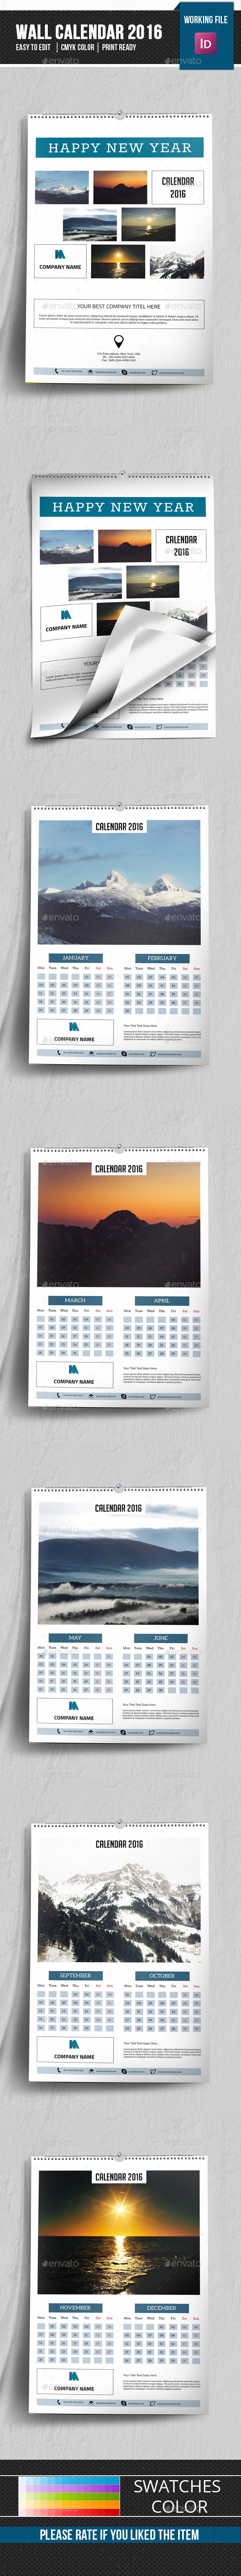 Wall Calendar Template-V12